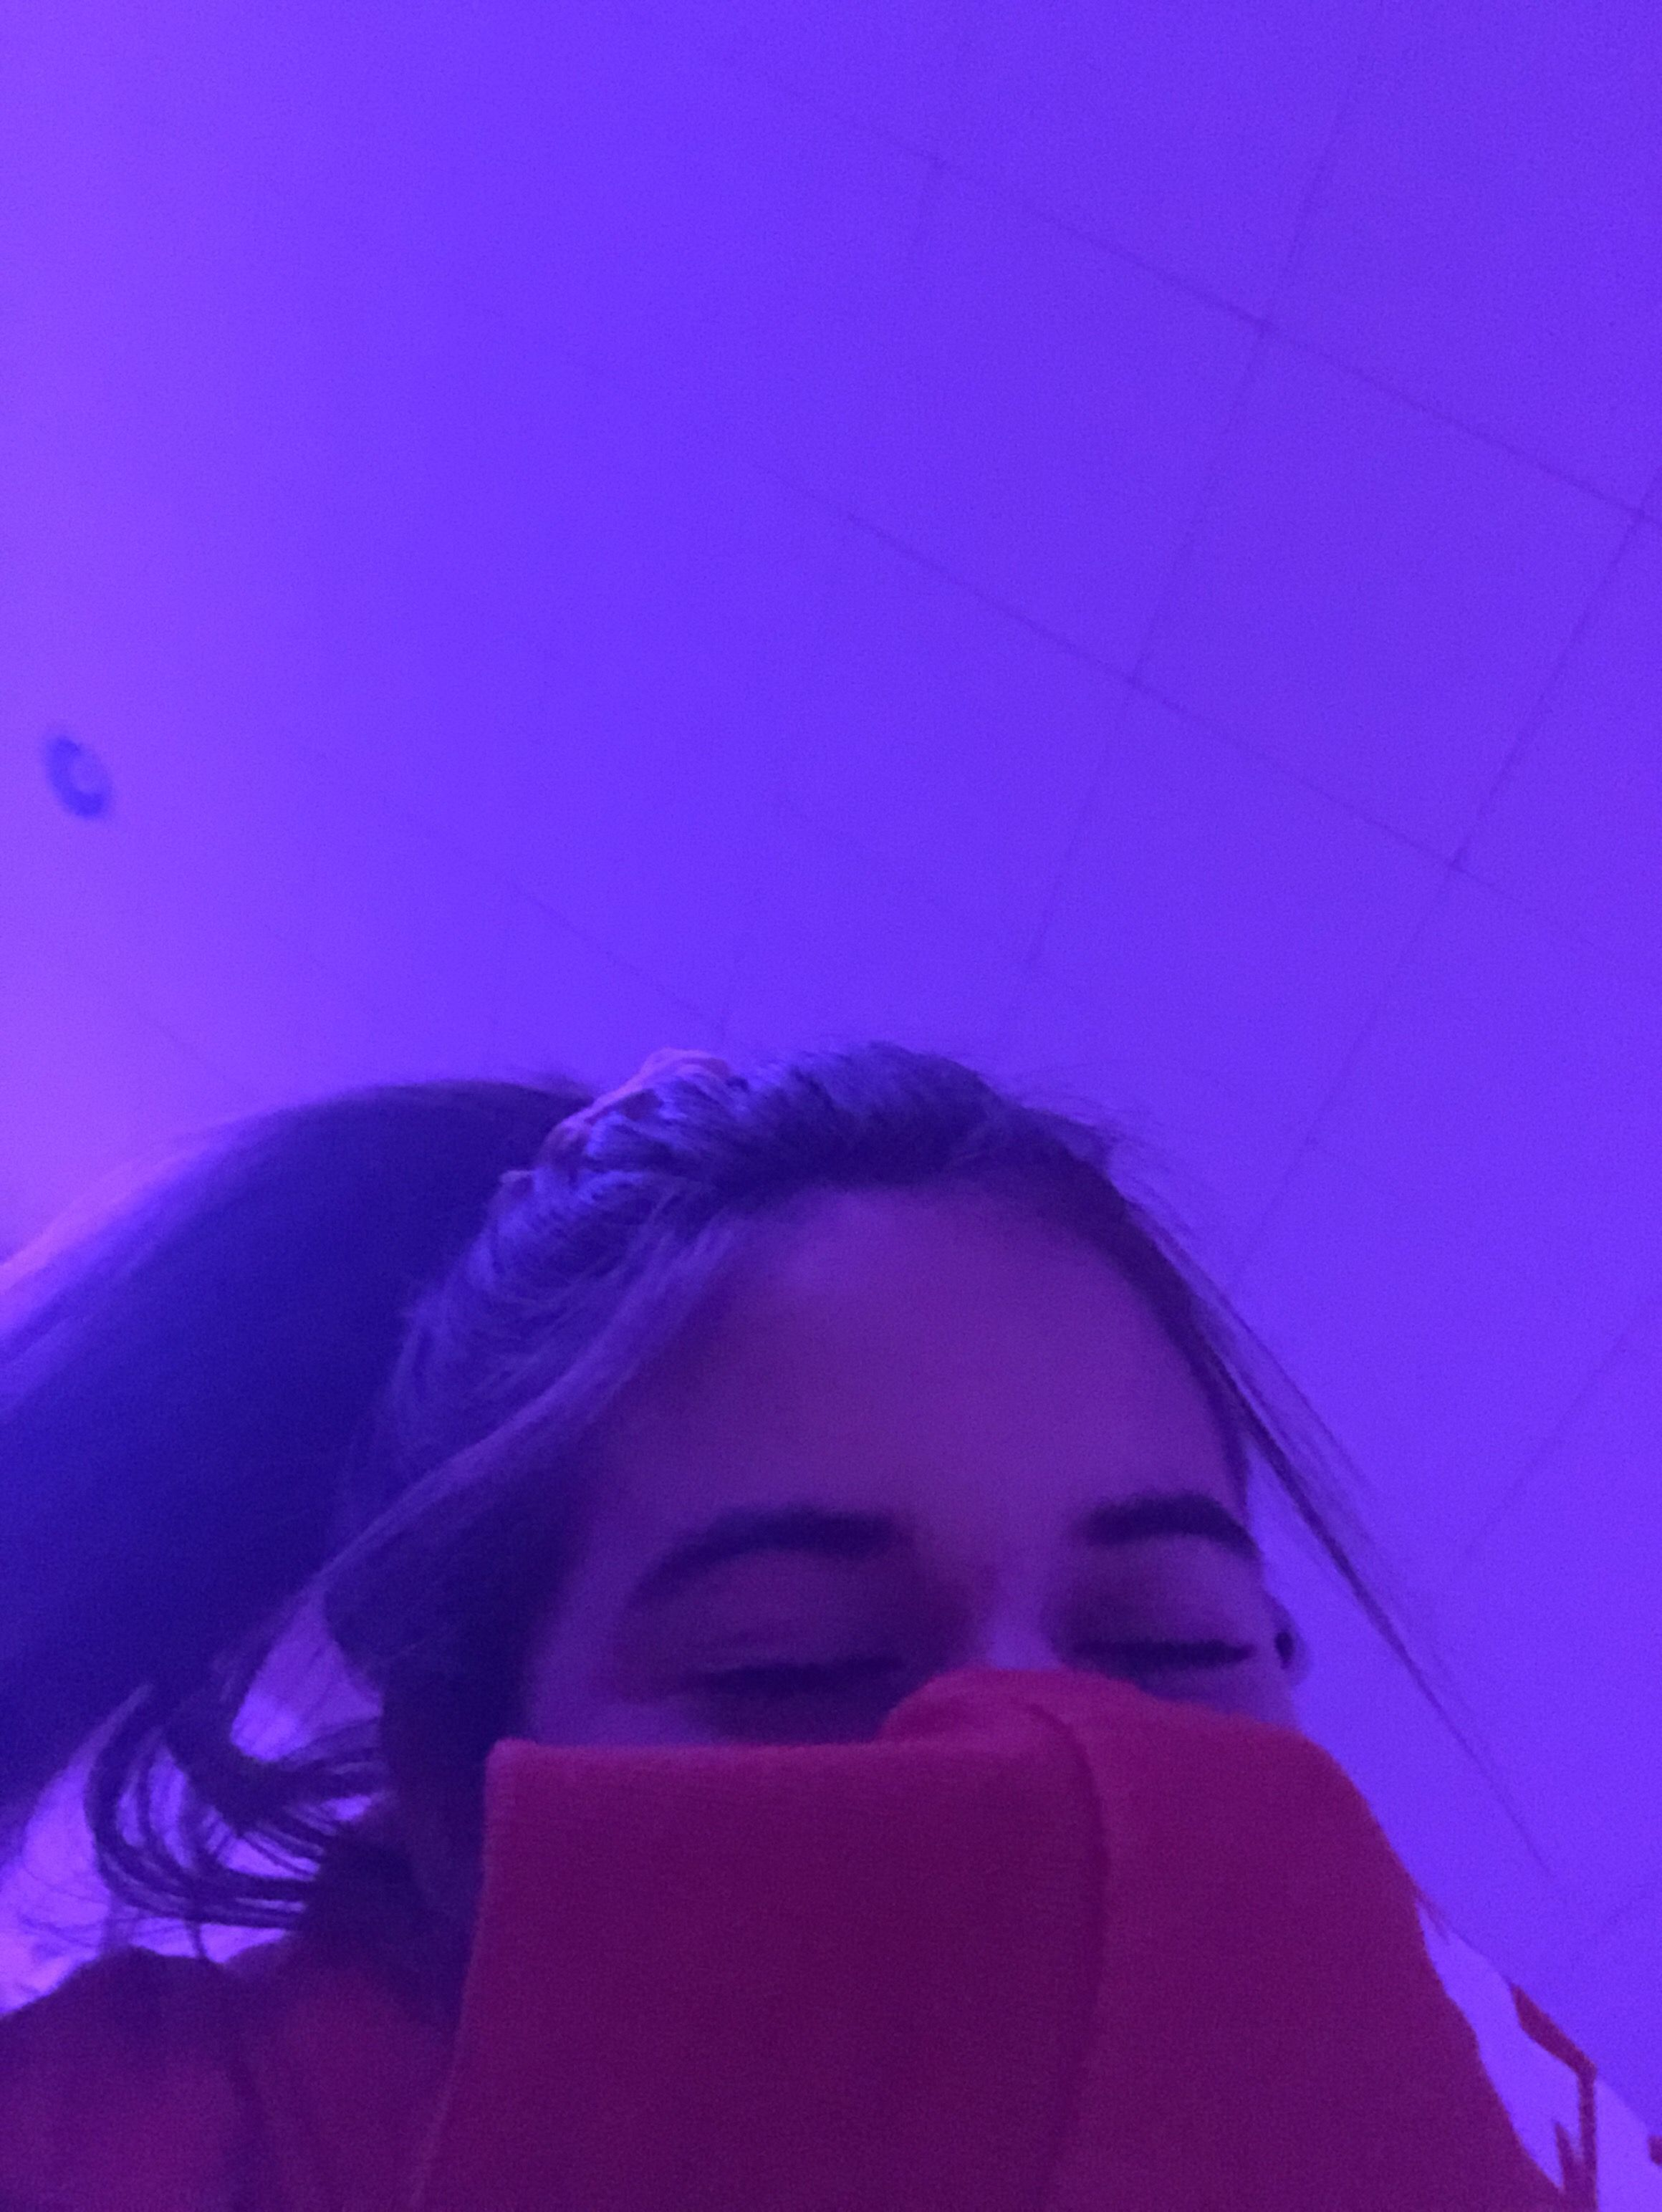 Purple Aesthetic Tumblr Cute